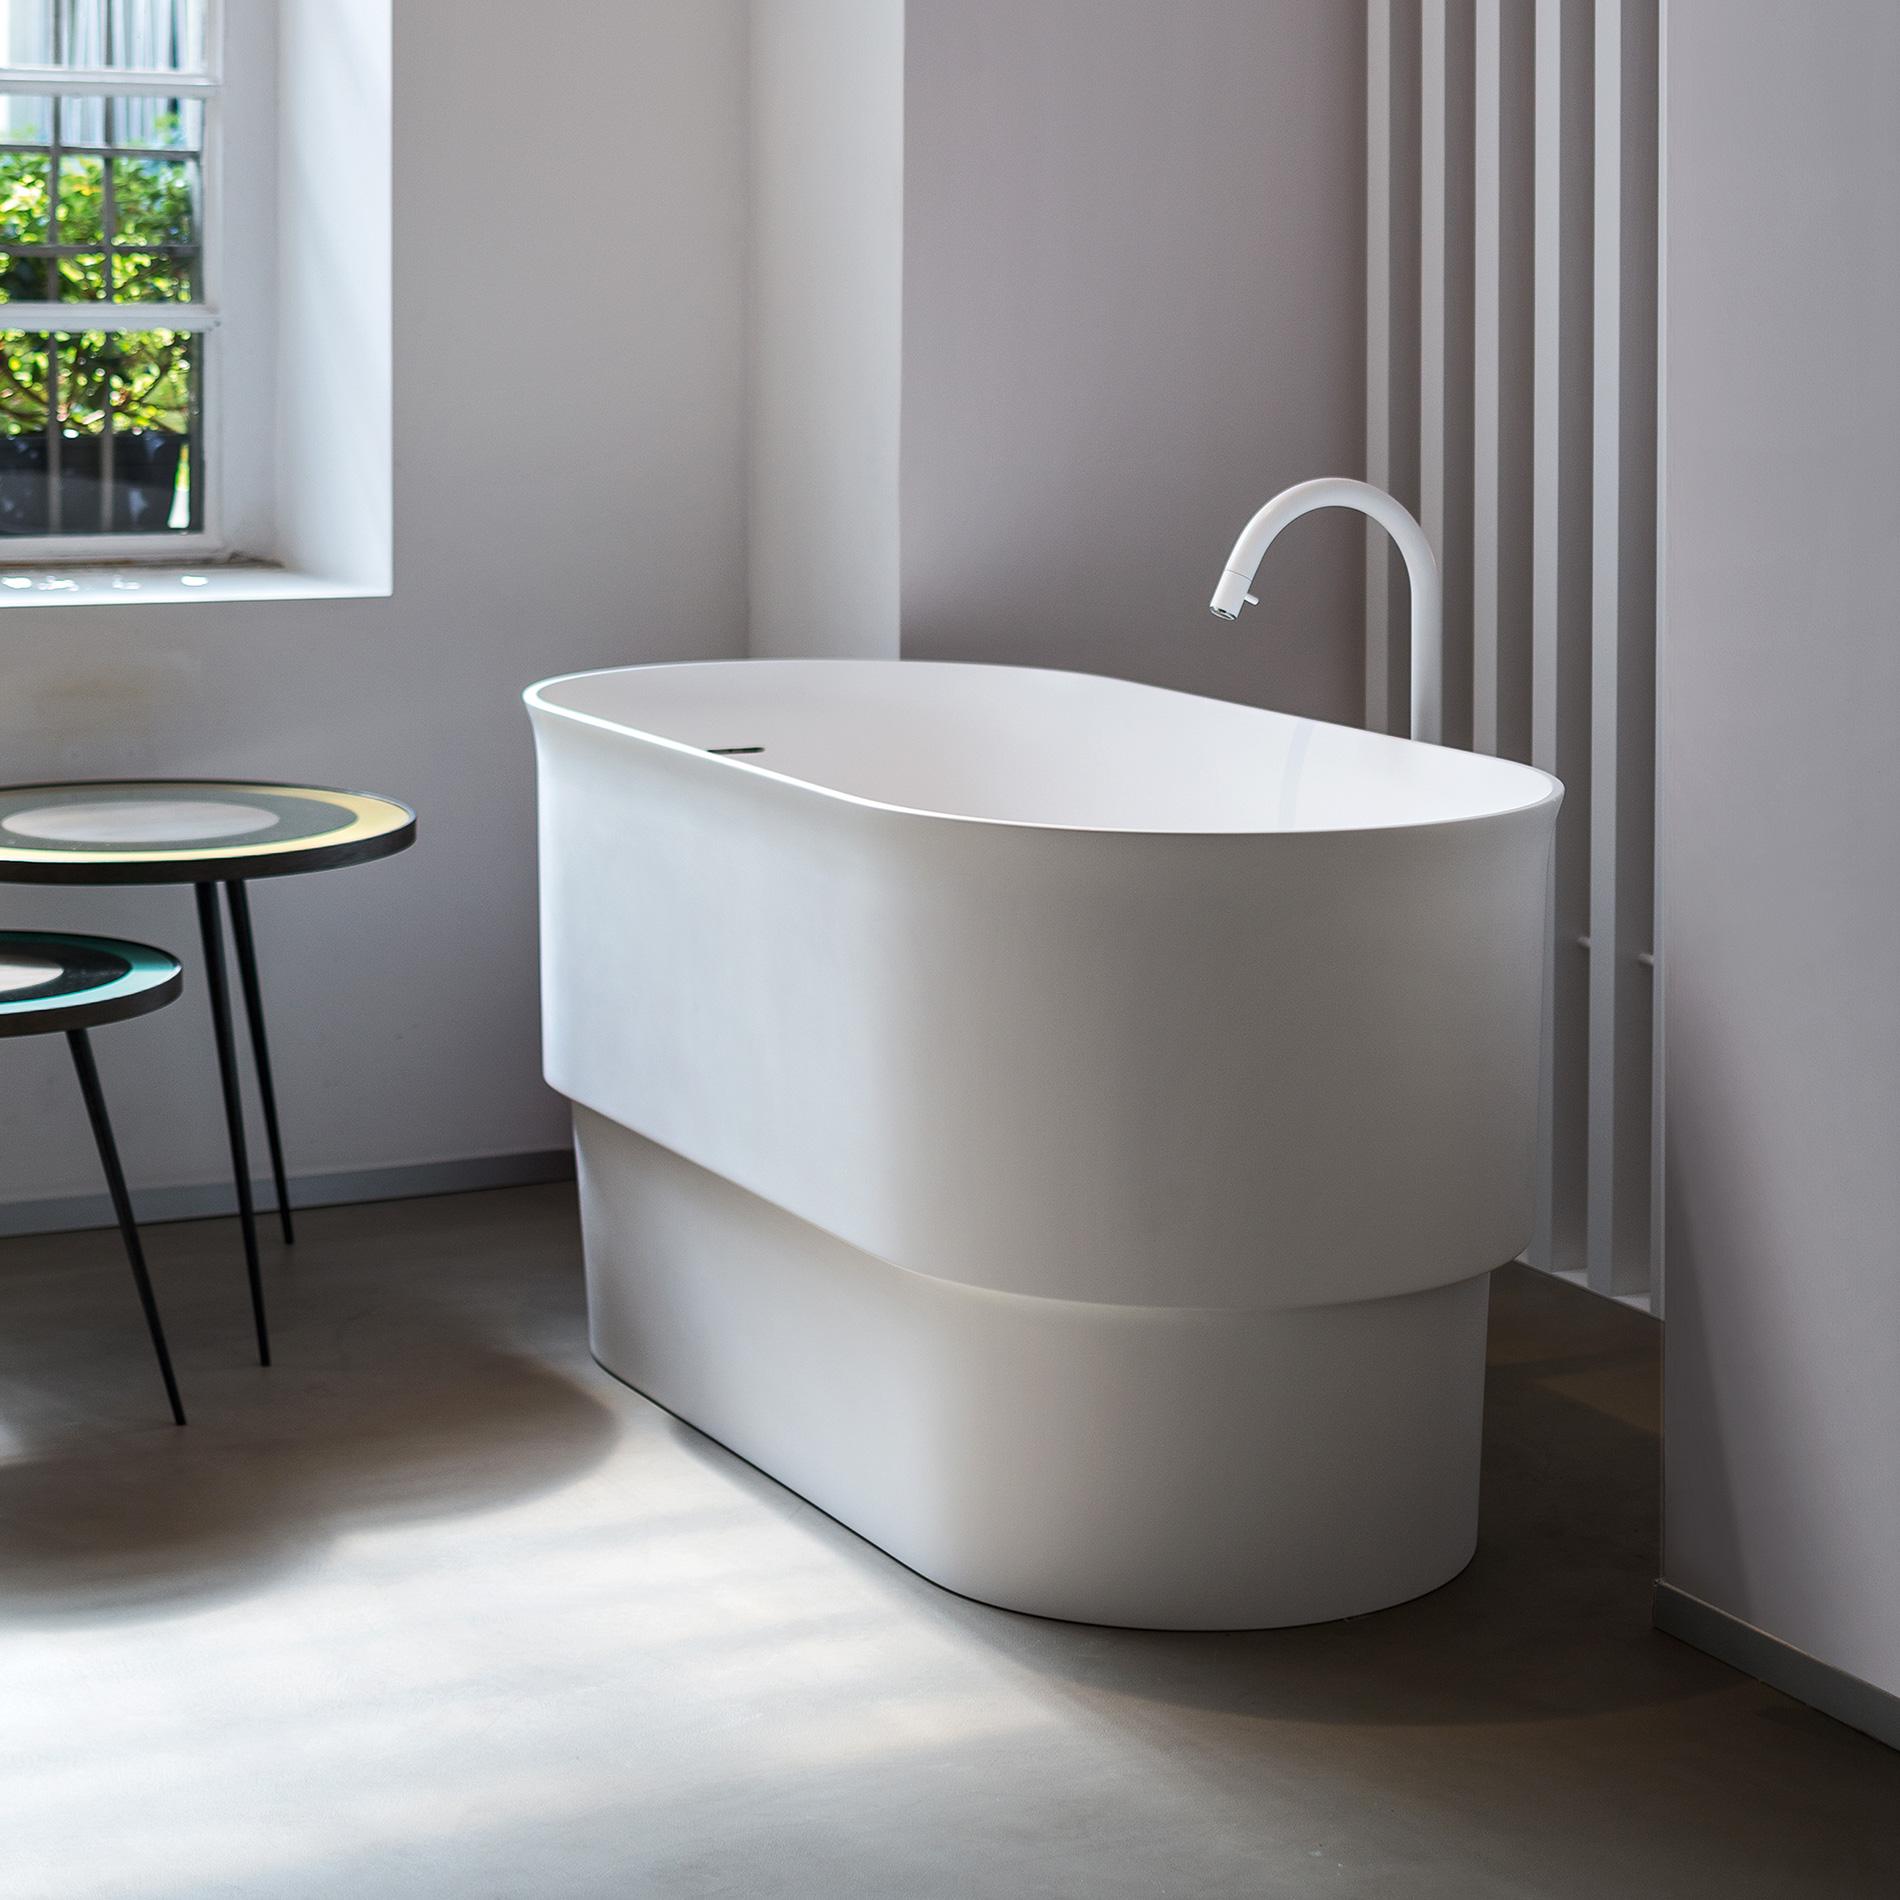 Nicos-International-home-products-Agape-tub-2